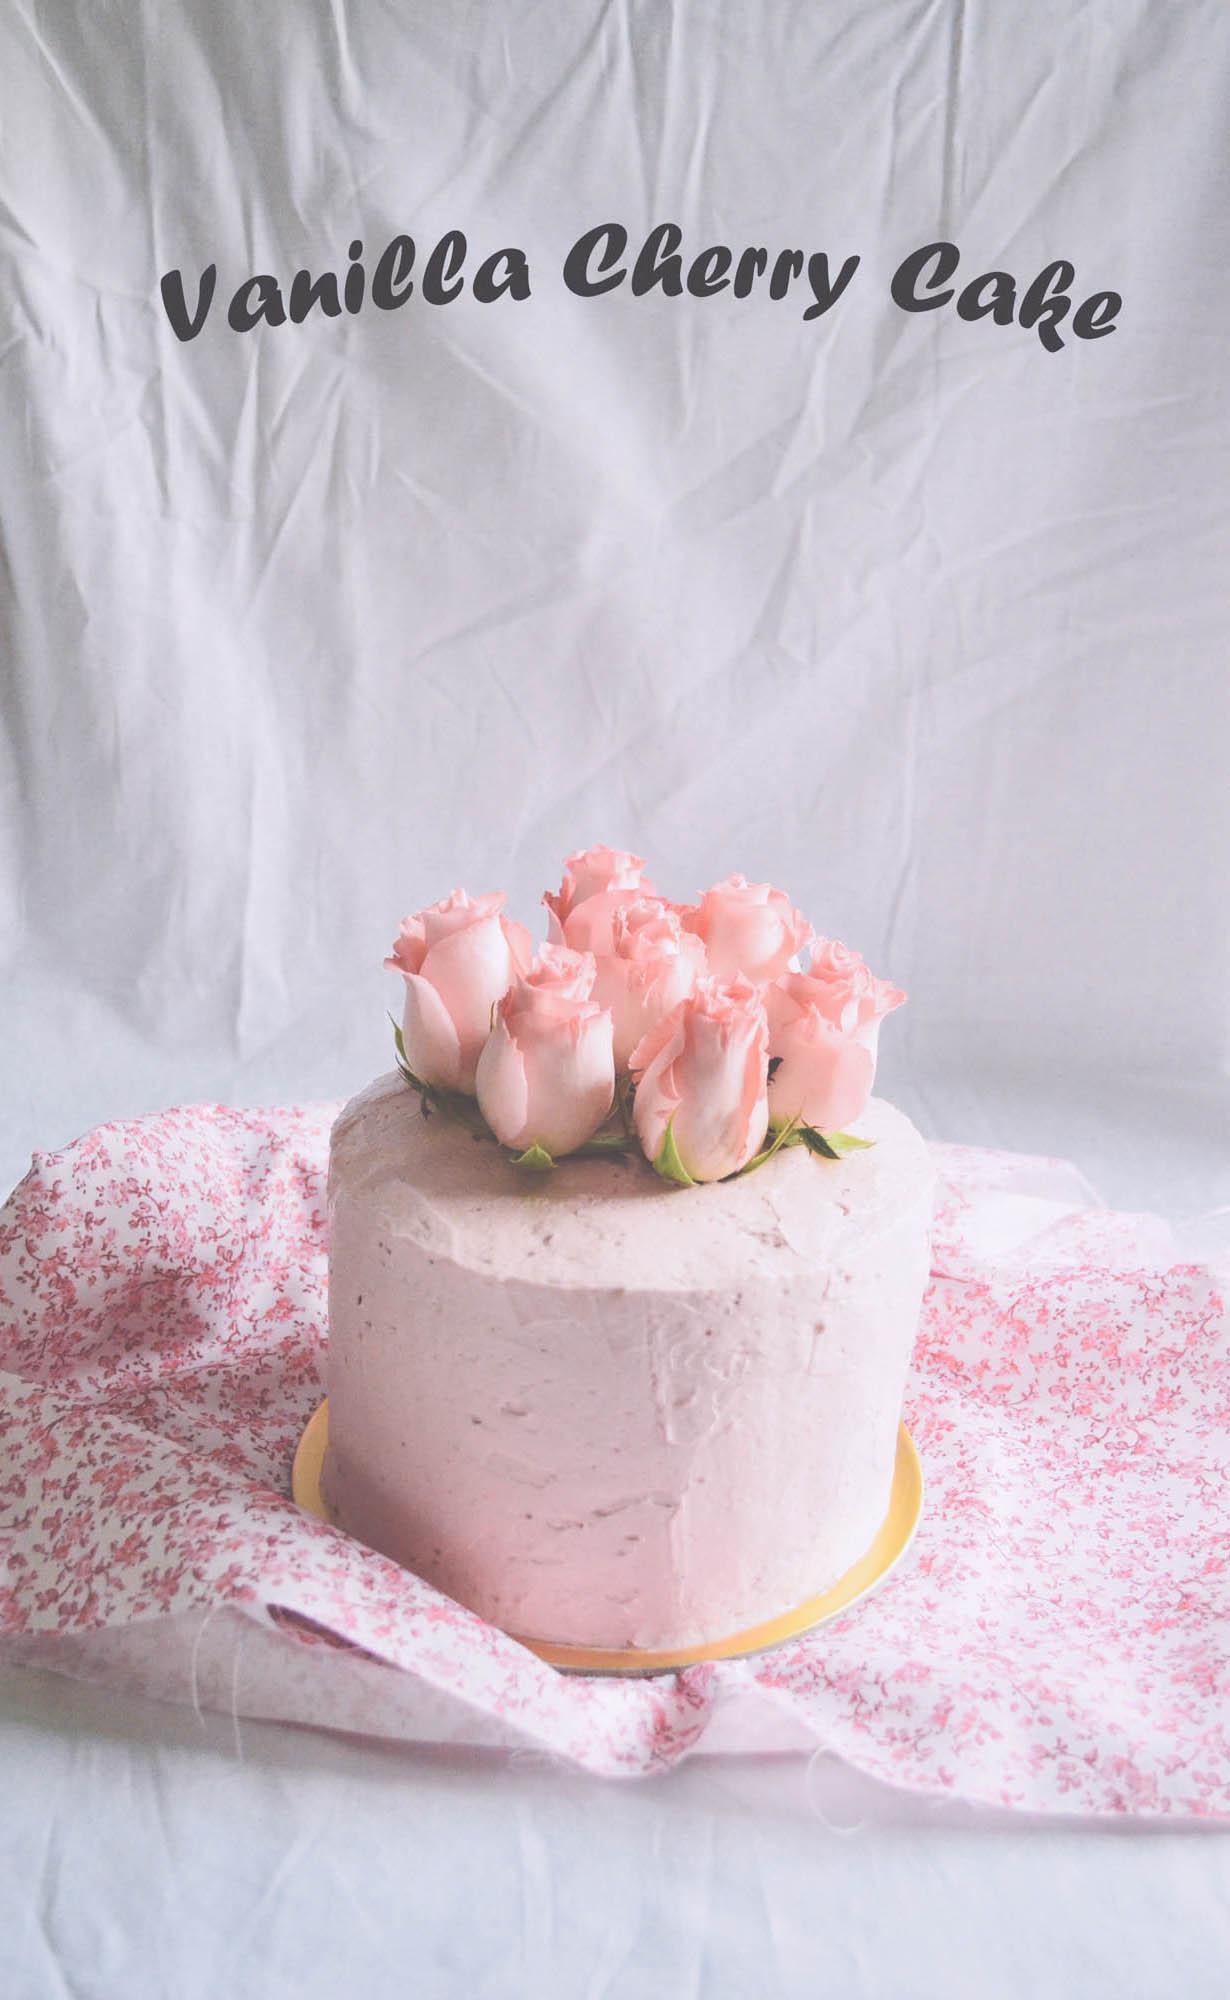 bday cake-8